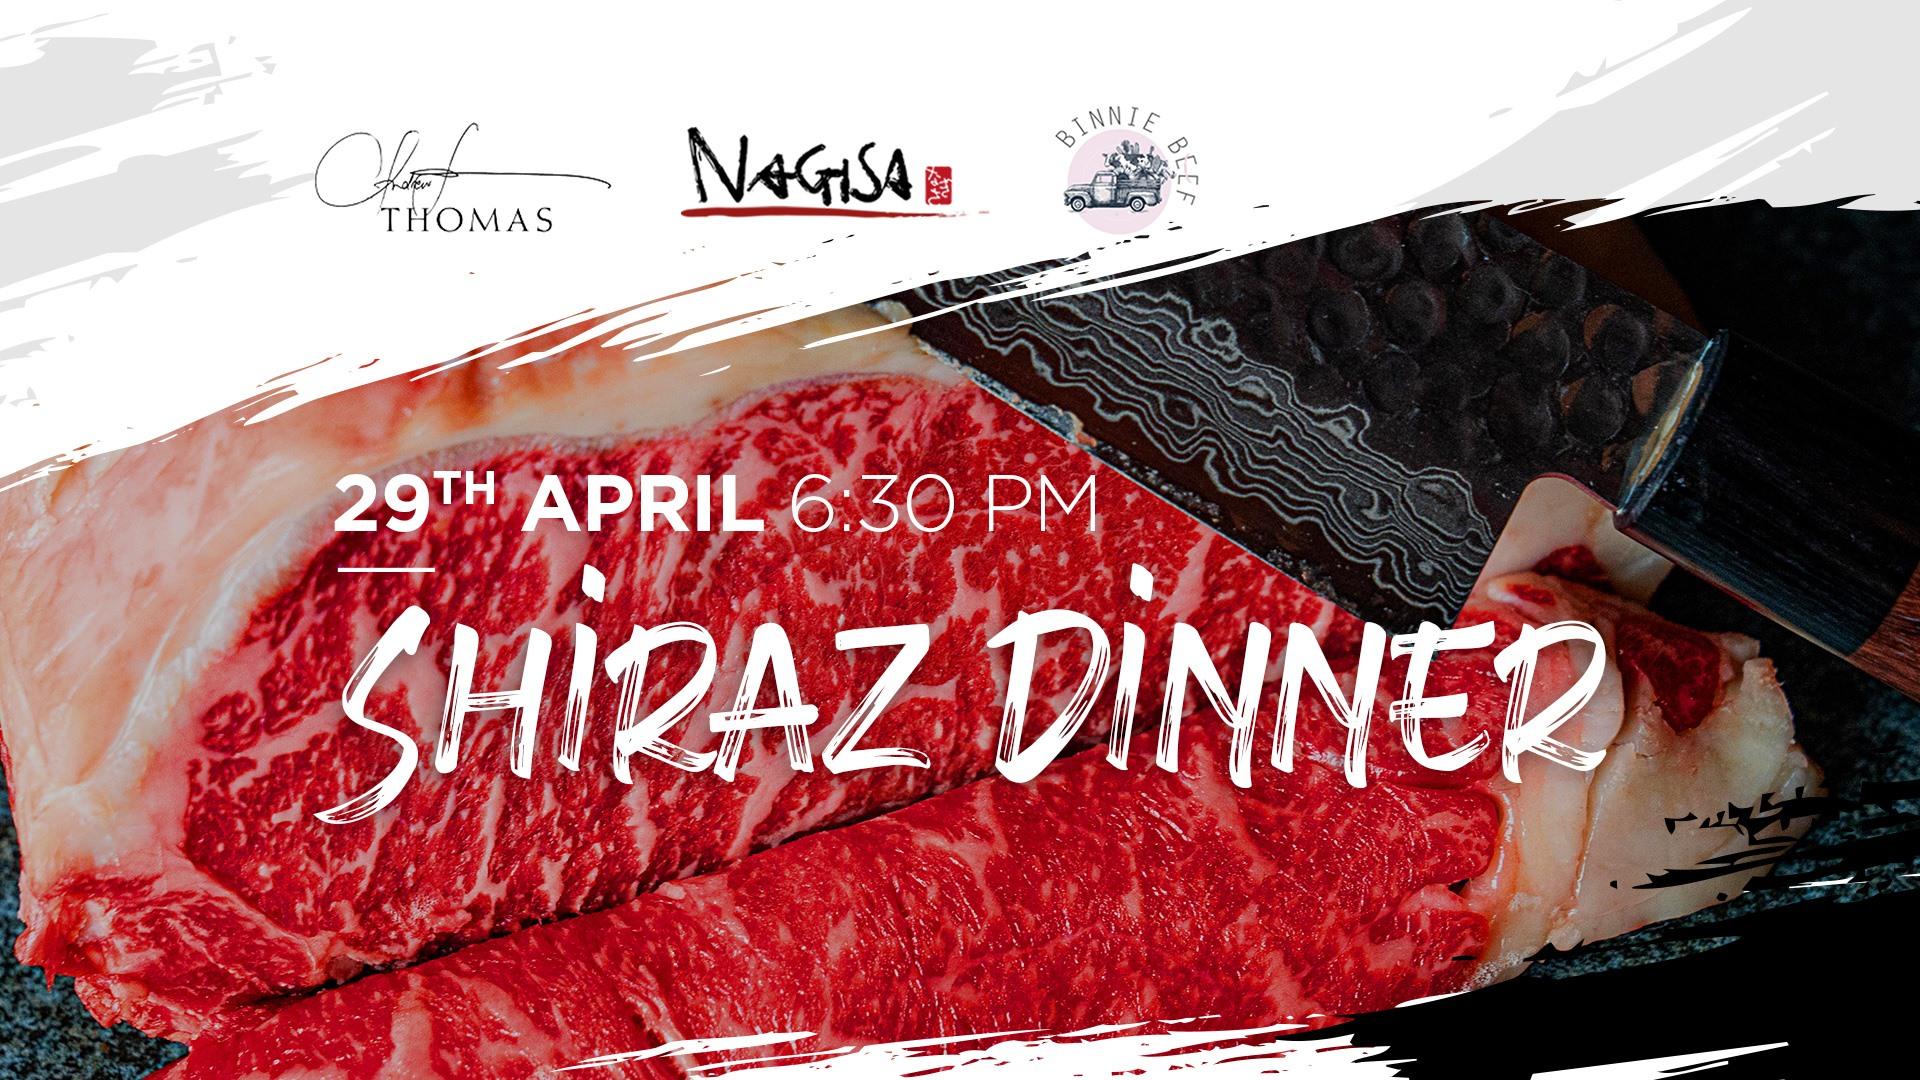 Thomas Wines X Nagisa X Binnie Beef Shiraz Dinner